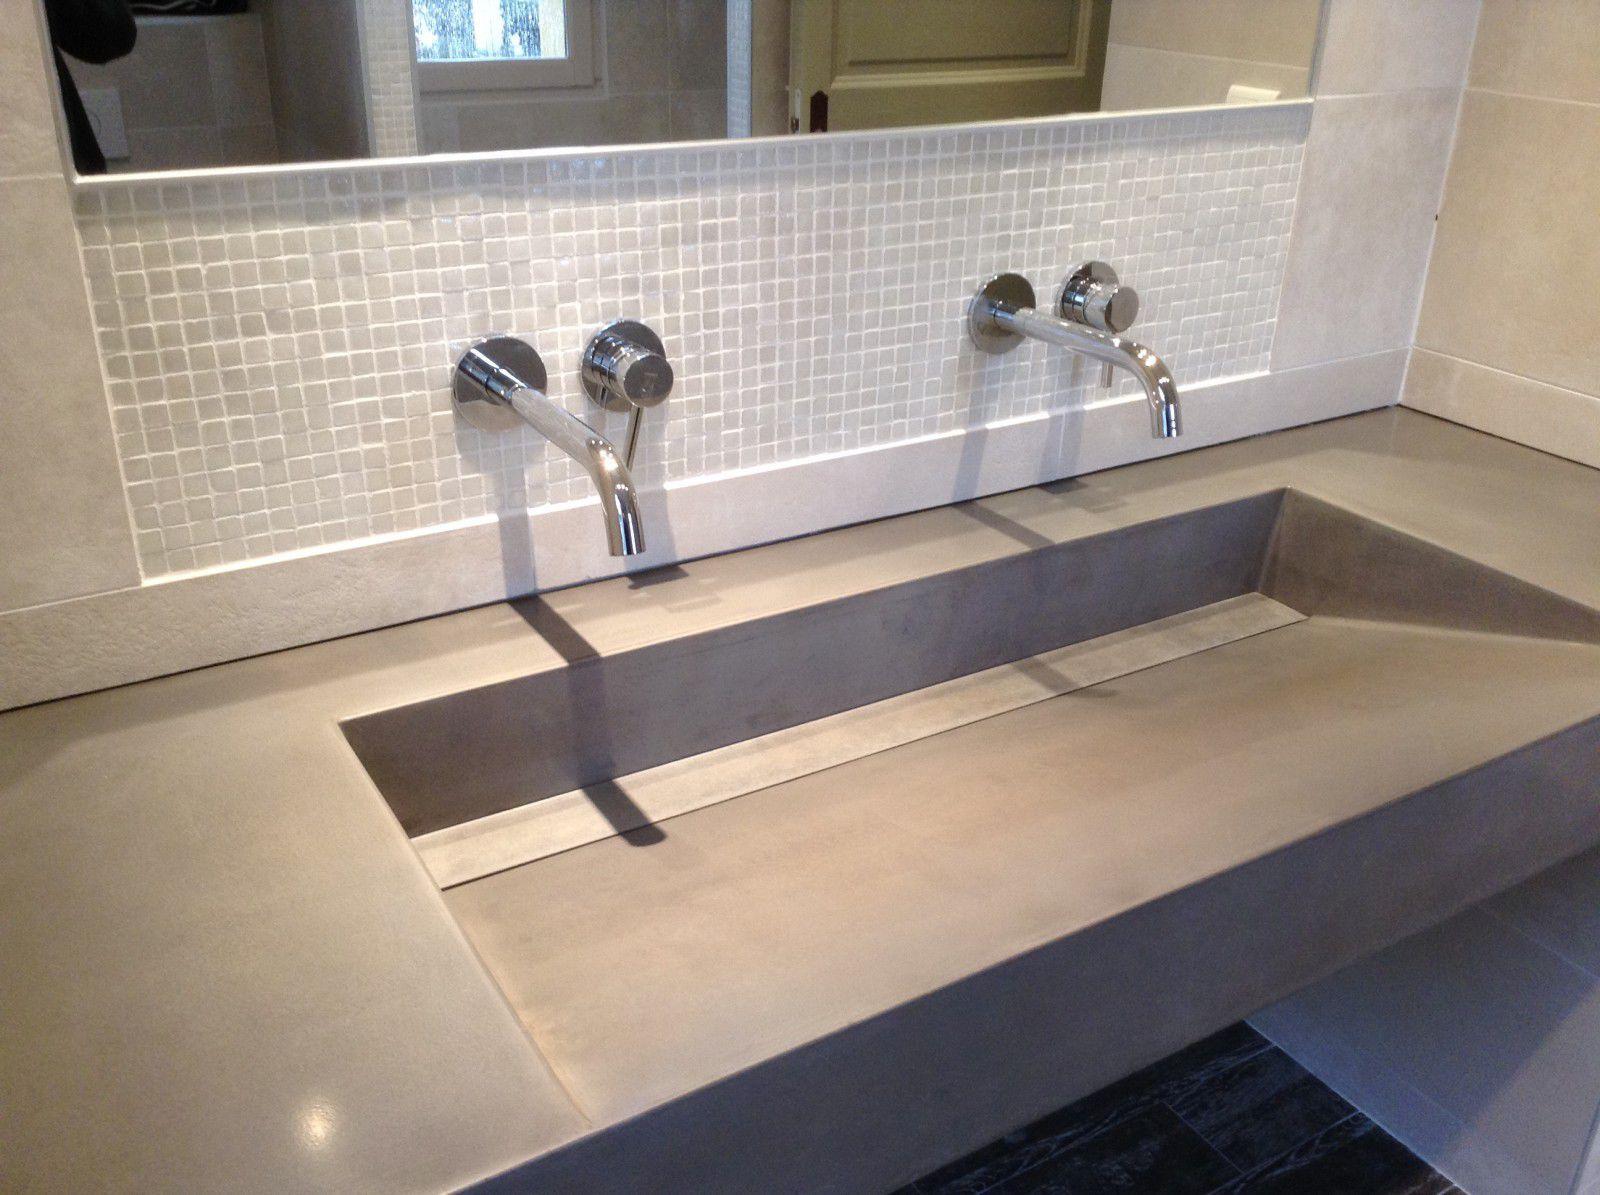 Waschtischplatte / bfuhp Ductal© Beton / kundenspezifisch - LAME ... | {Waschtischplatte beton 62}